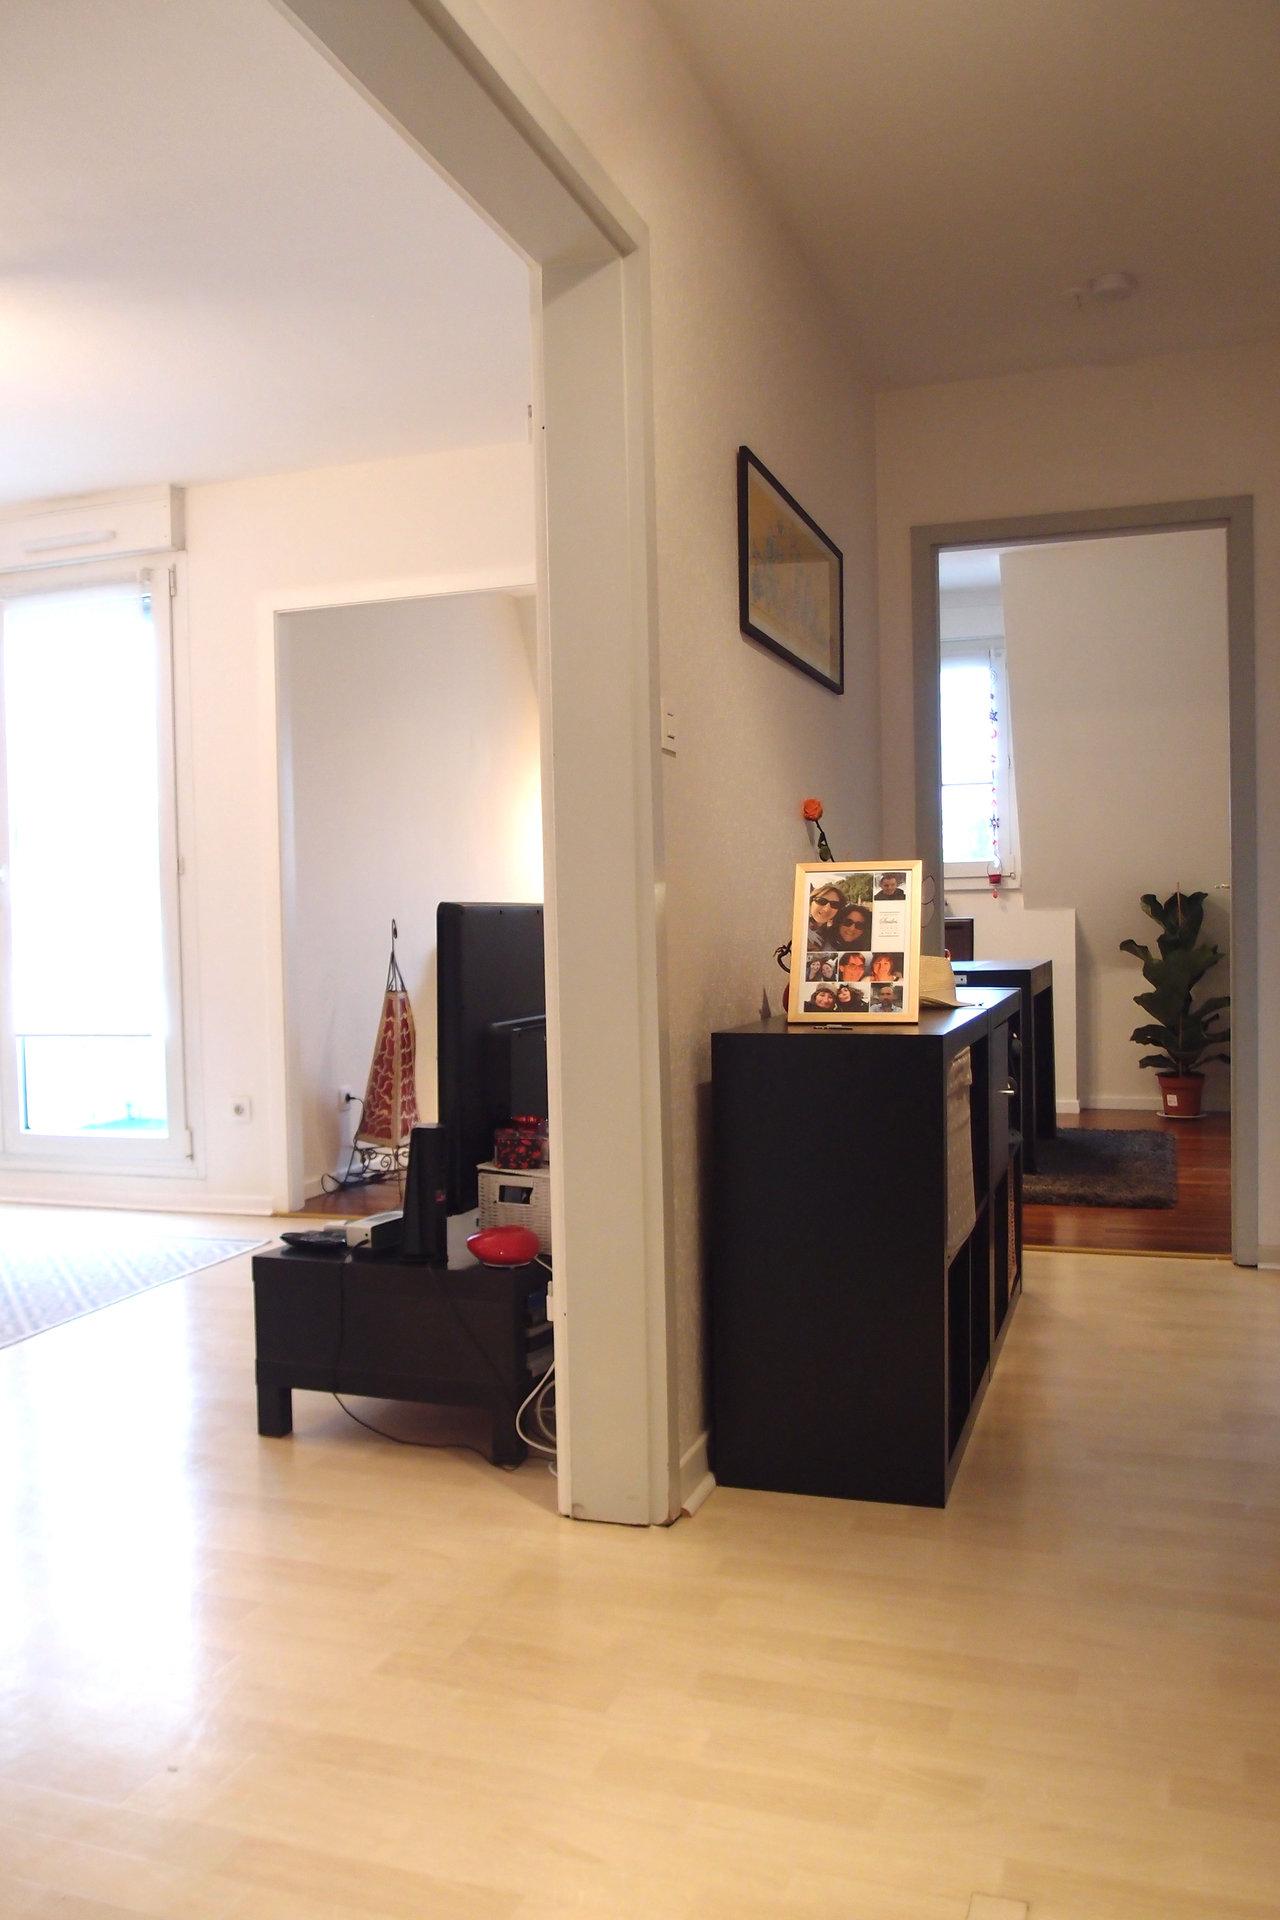 Eckbolsheim - Appartement 3 pièces avec balcon